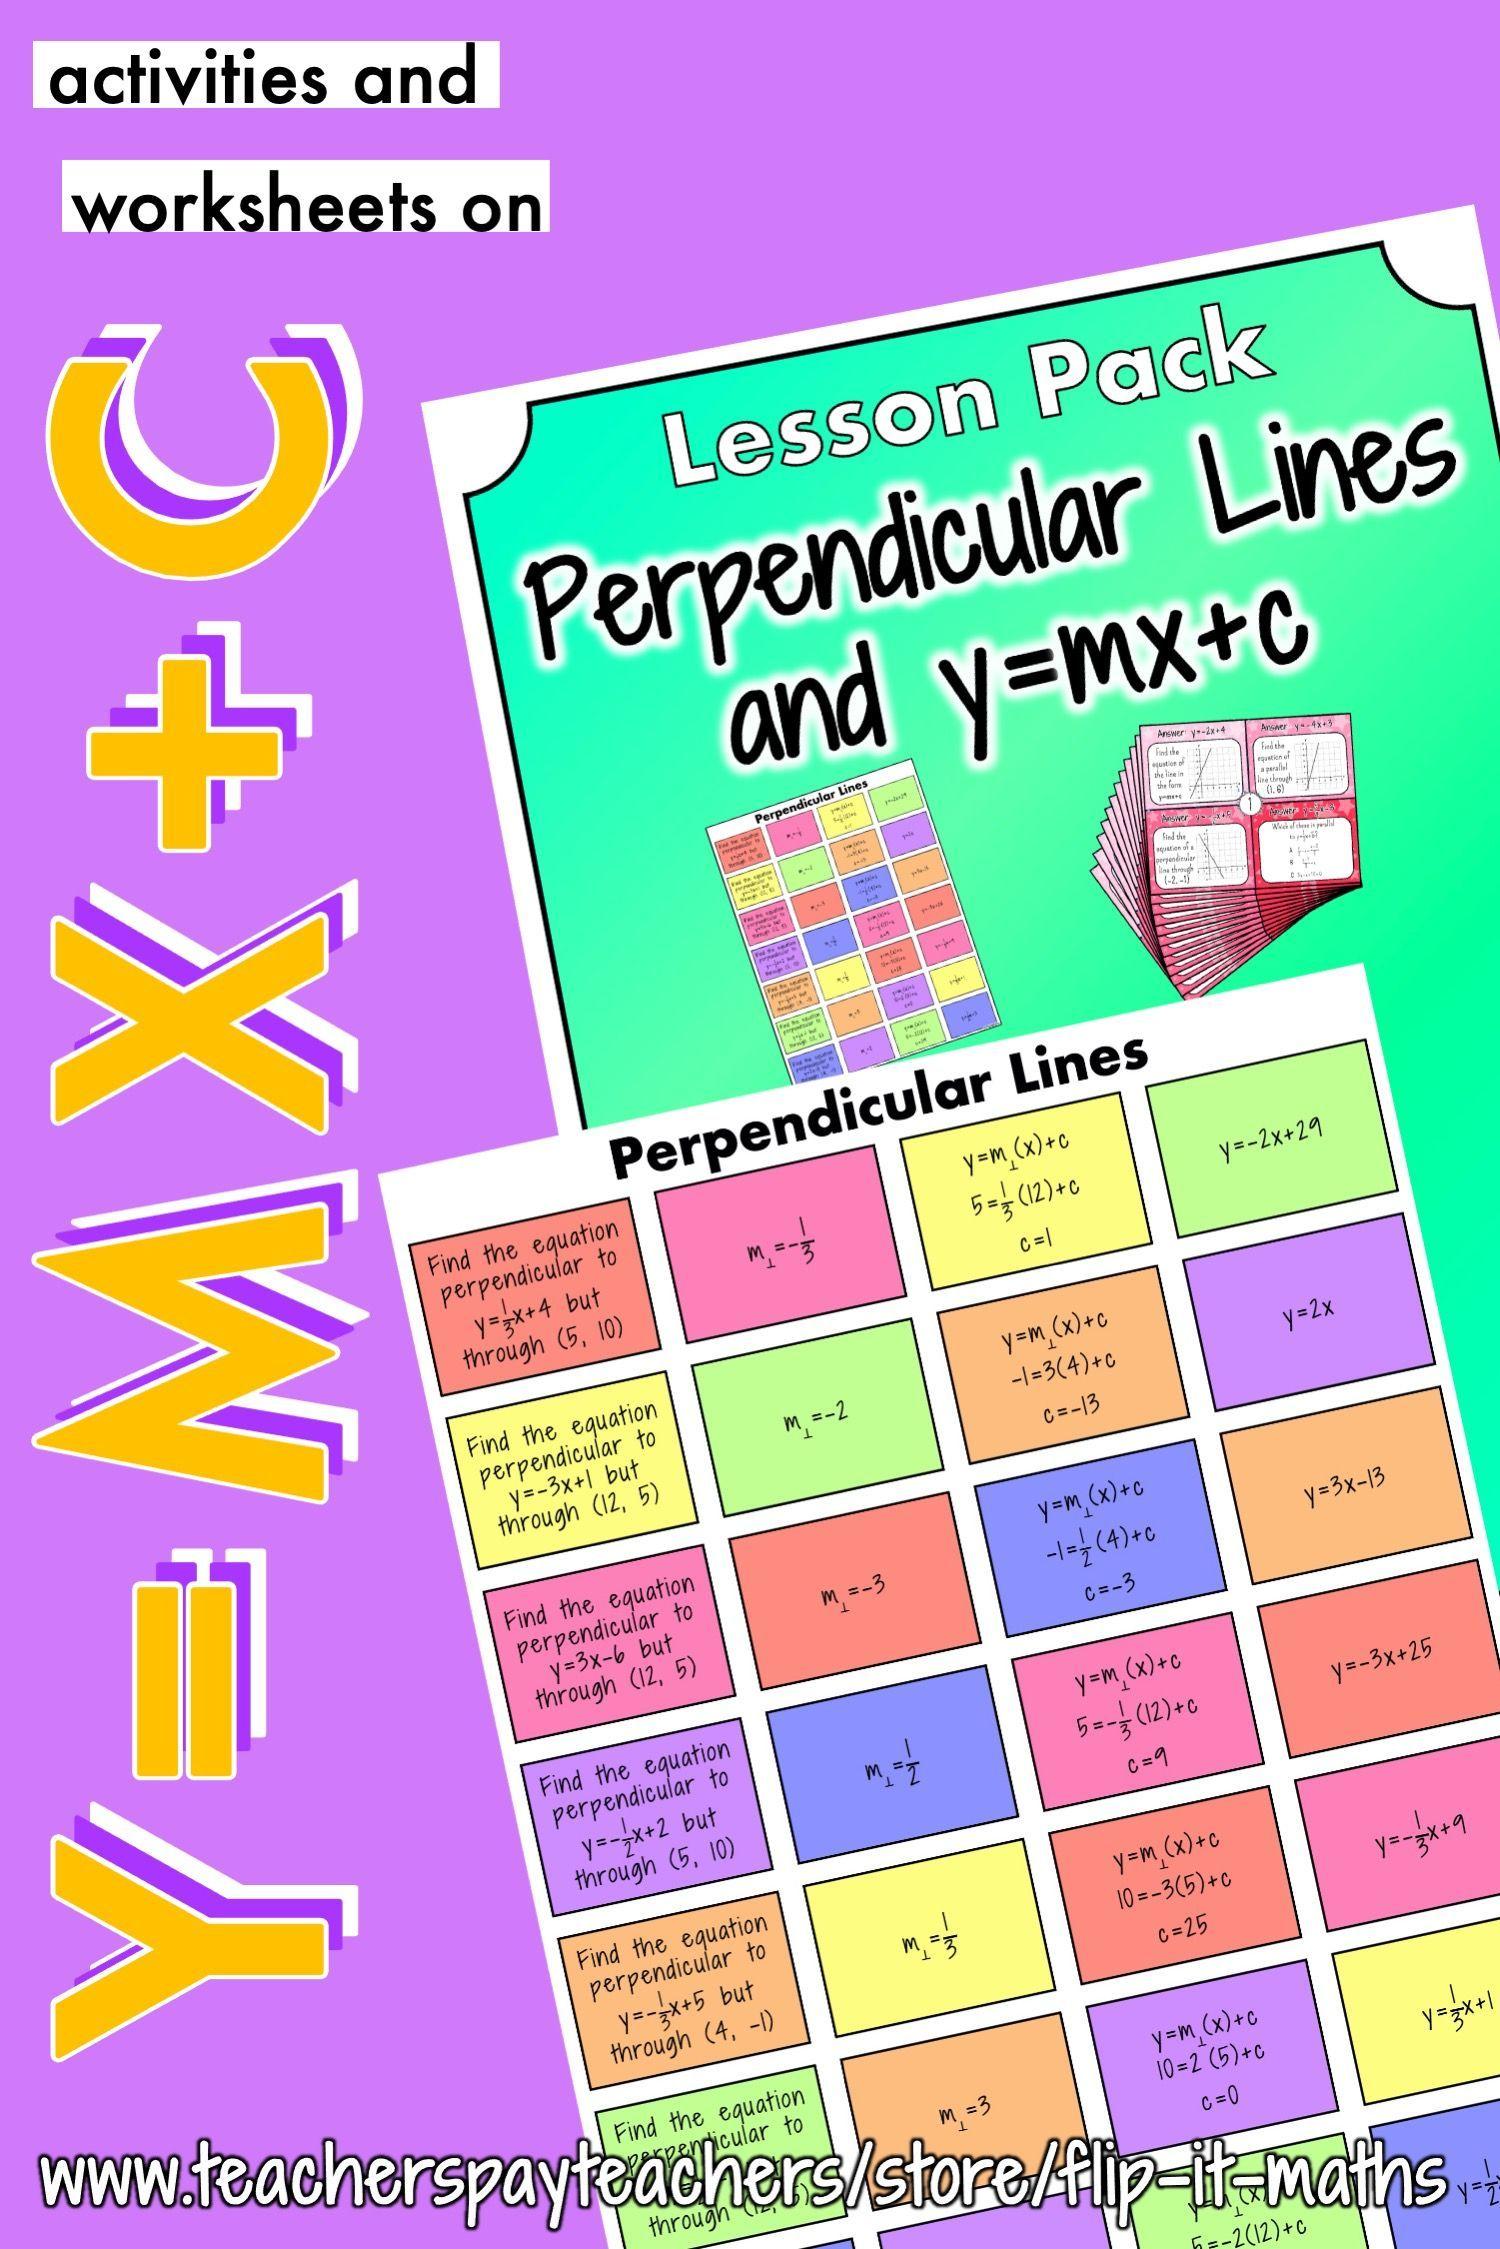 Perpendicular Lines In